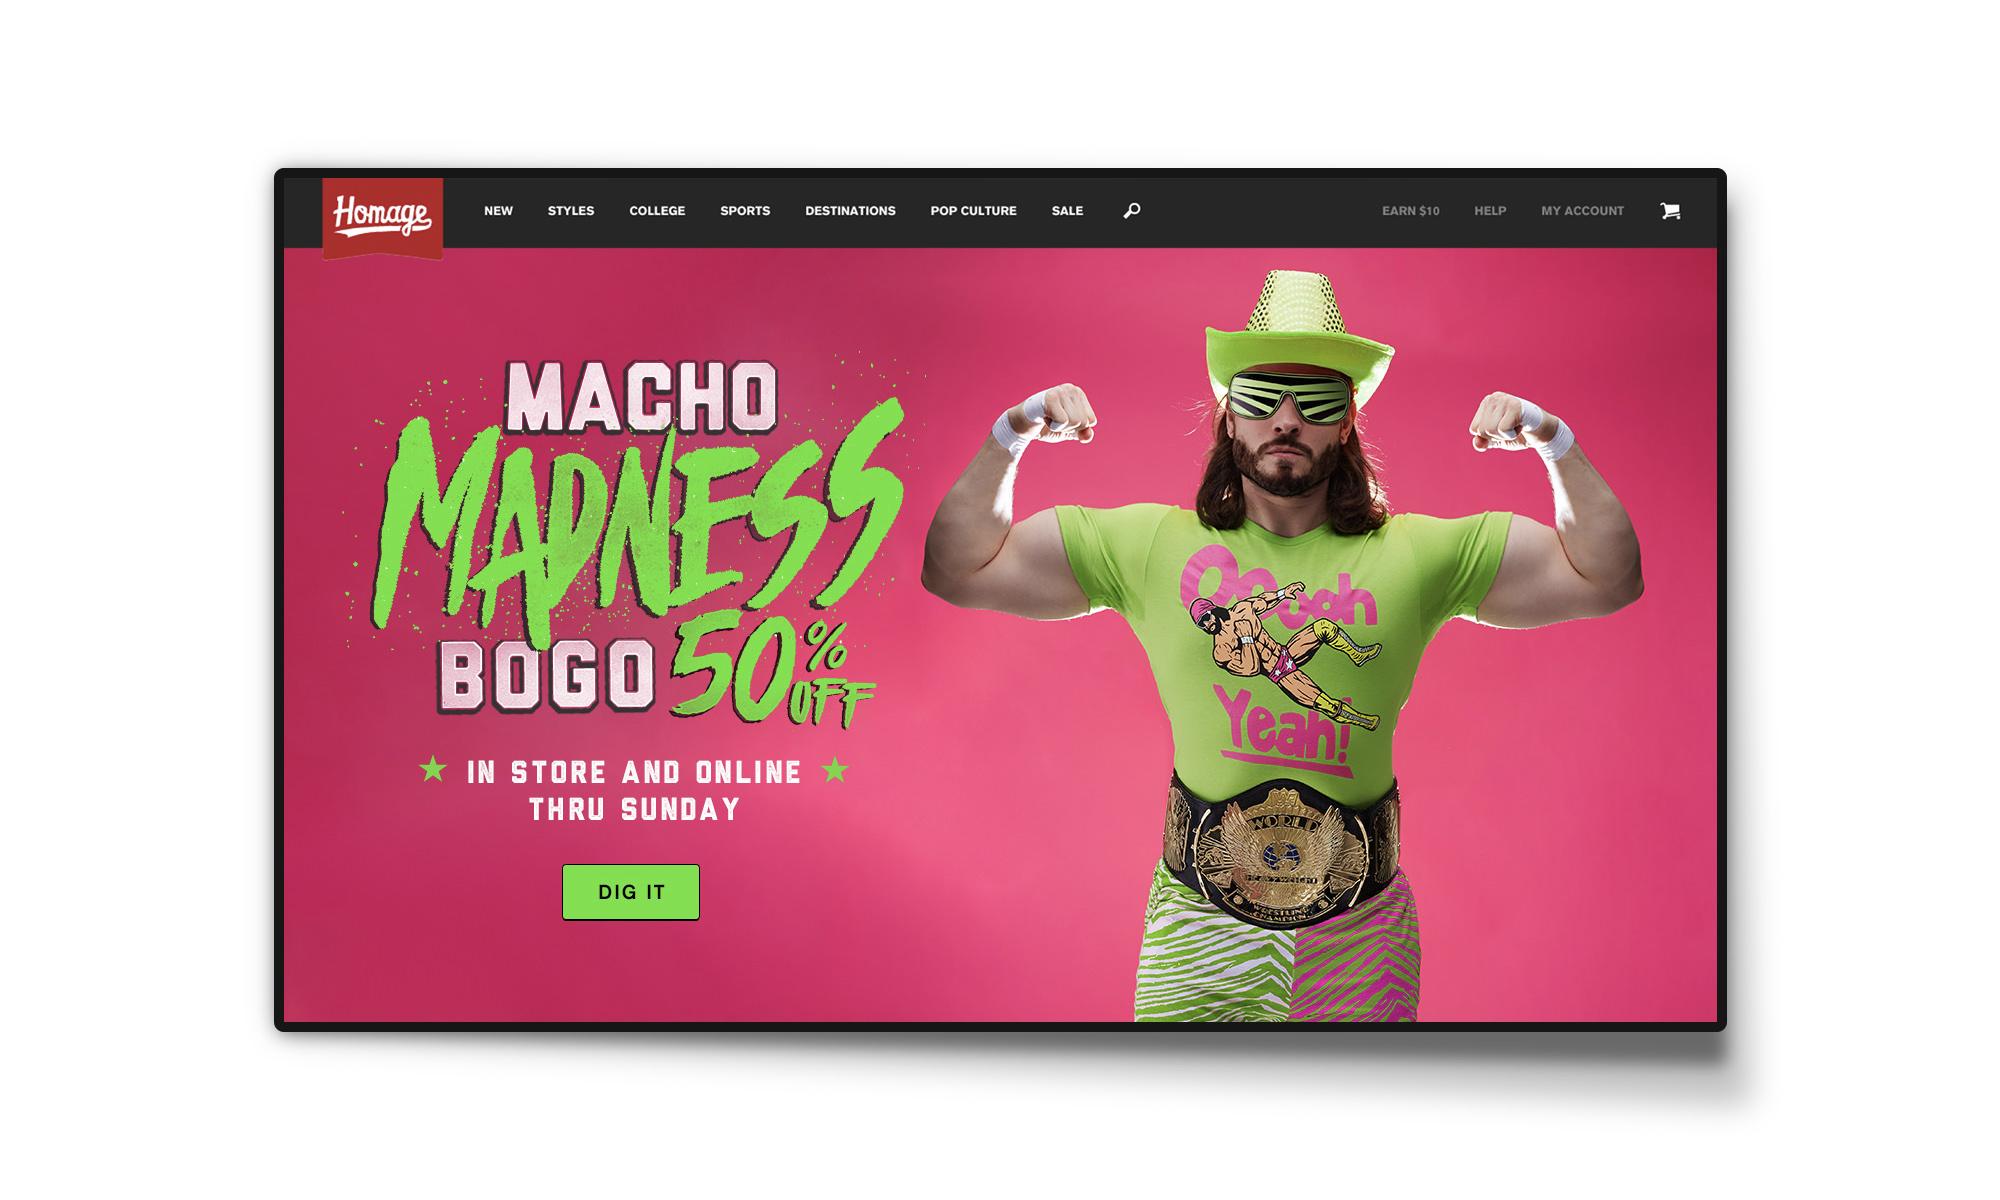 macho-madness-neon-desktop.jpg